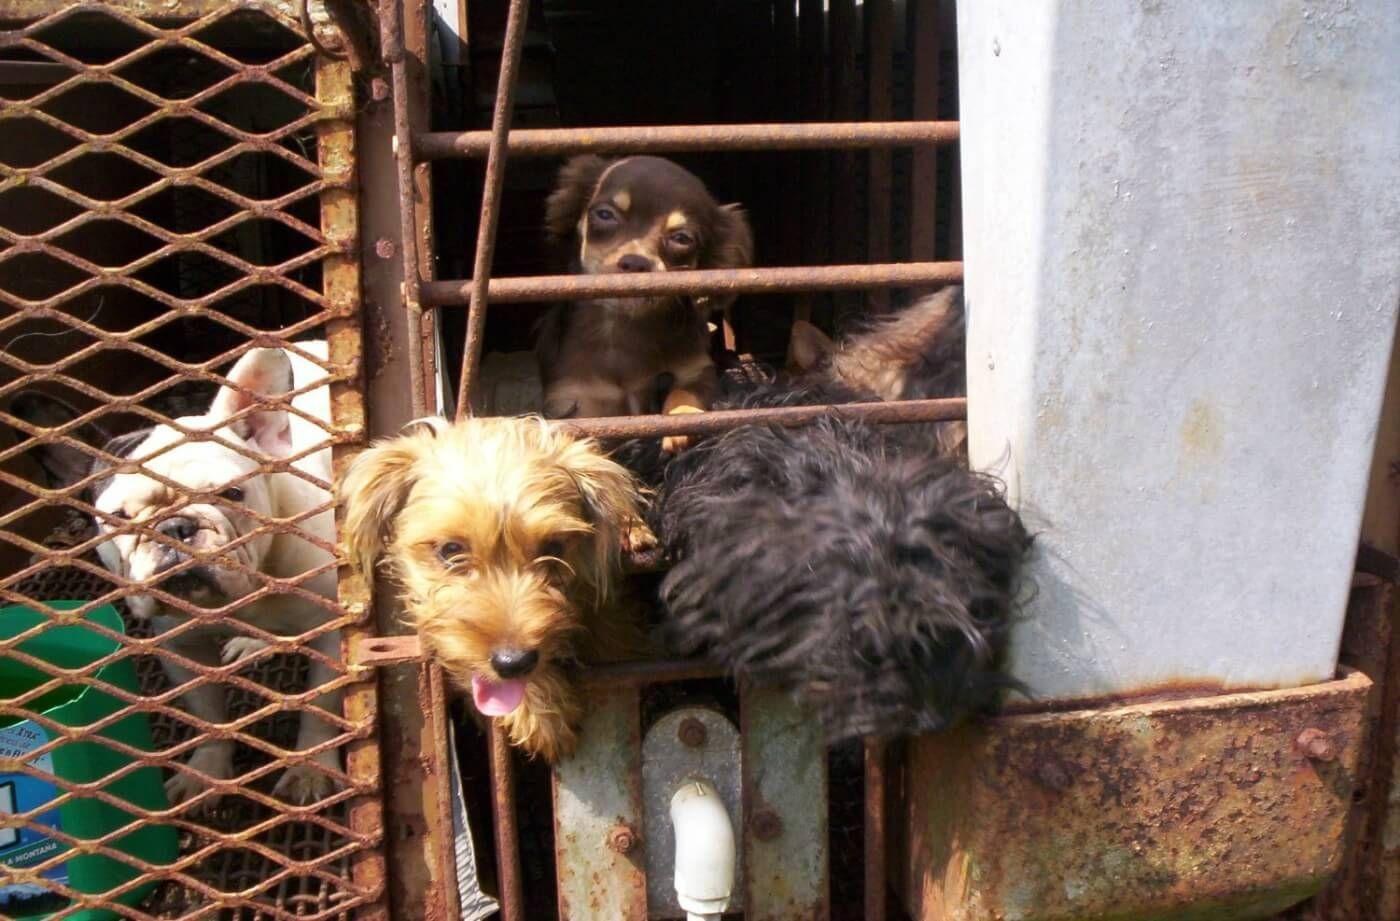 MultimillionDollar 'Puppy Mill Rescue' Fined 15,000